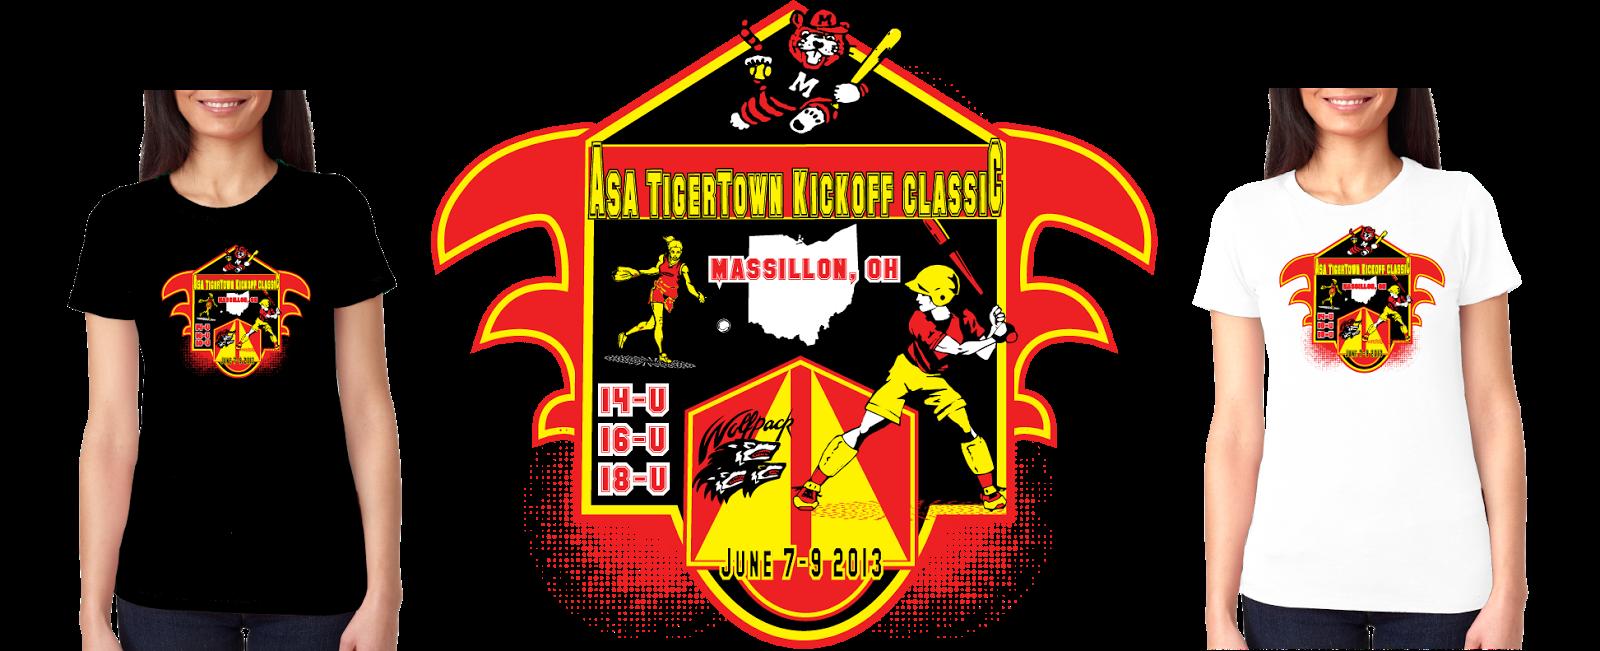 softball custom logo design for sporting event t shirt design by peter dranitsin t shirt - Softball Jersey Design Ideas